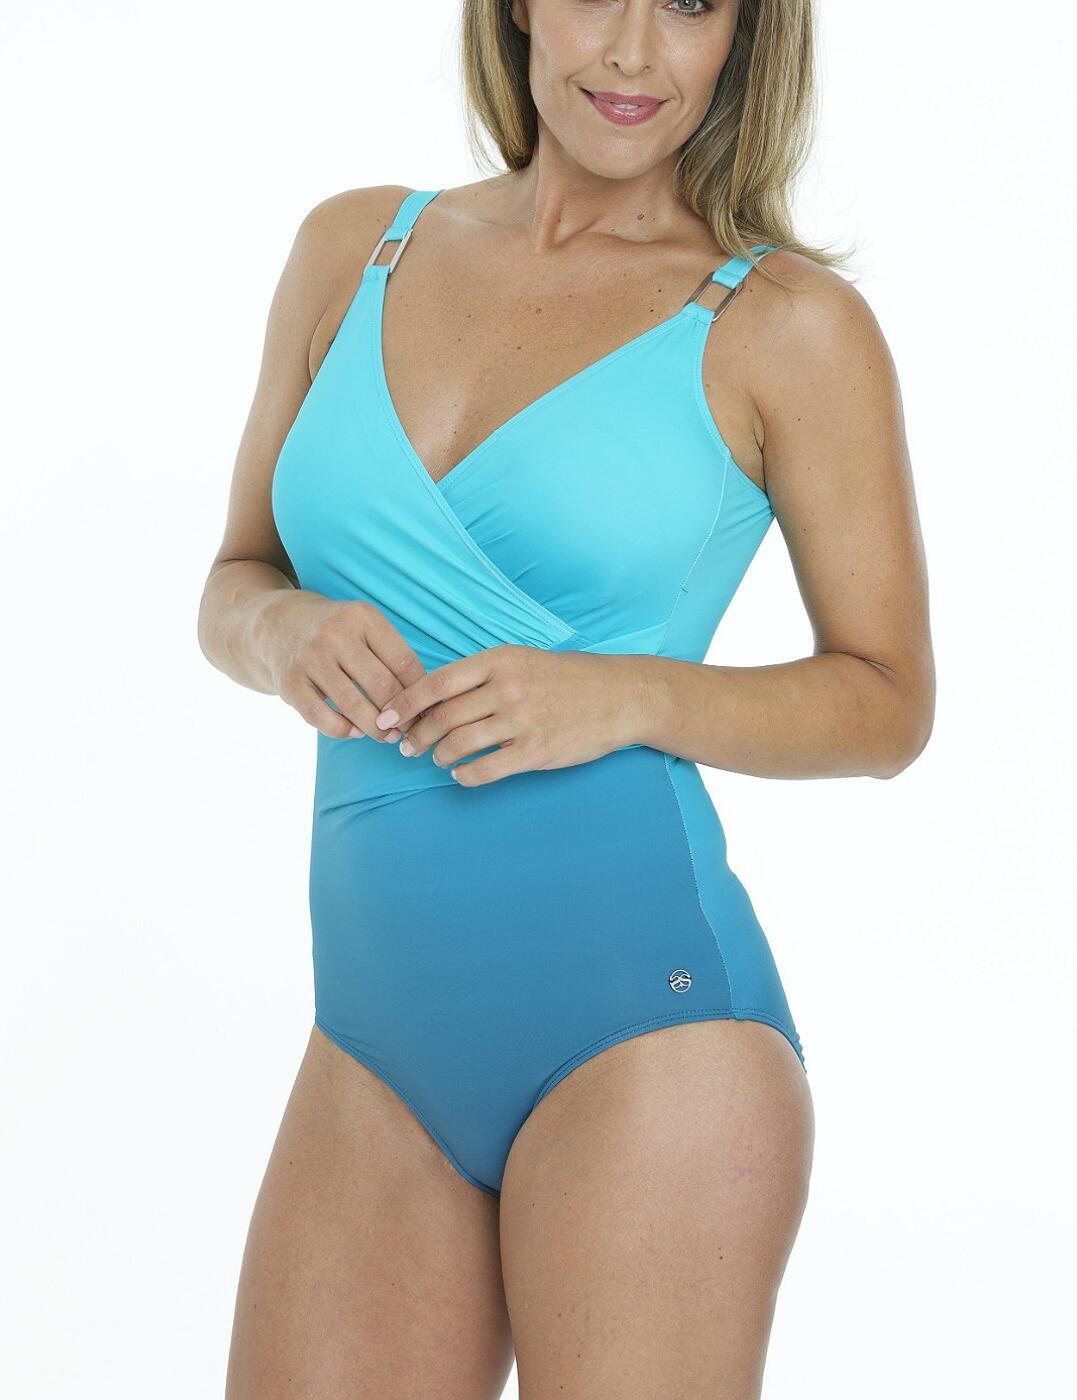 34-2184 SeaSpray Classic Draped Strapsuit Ombre Swimsuit - 34-2184 Lagoon